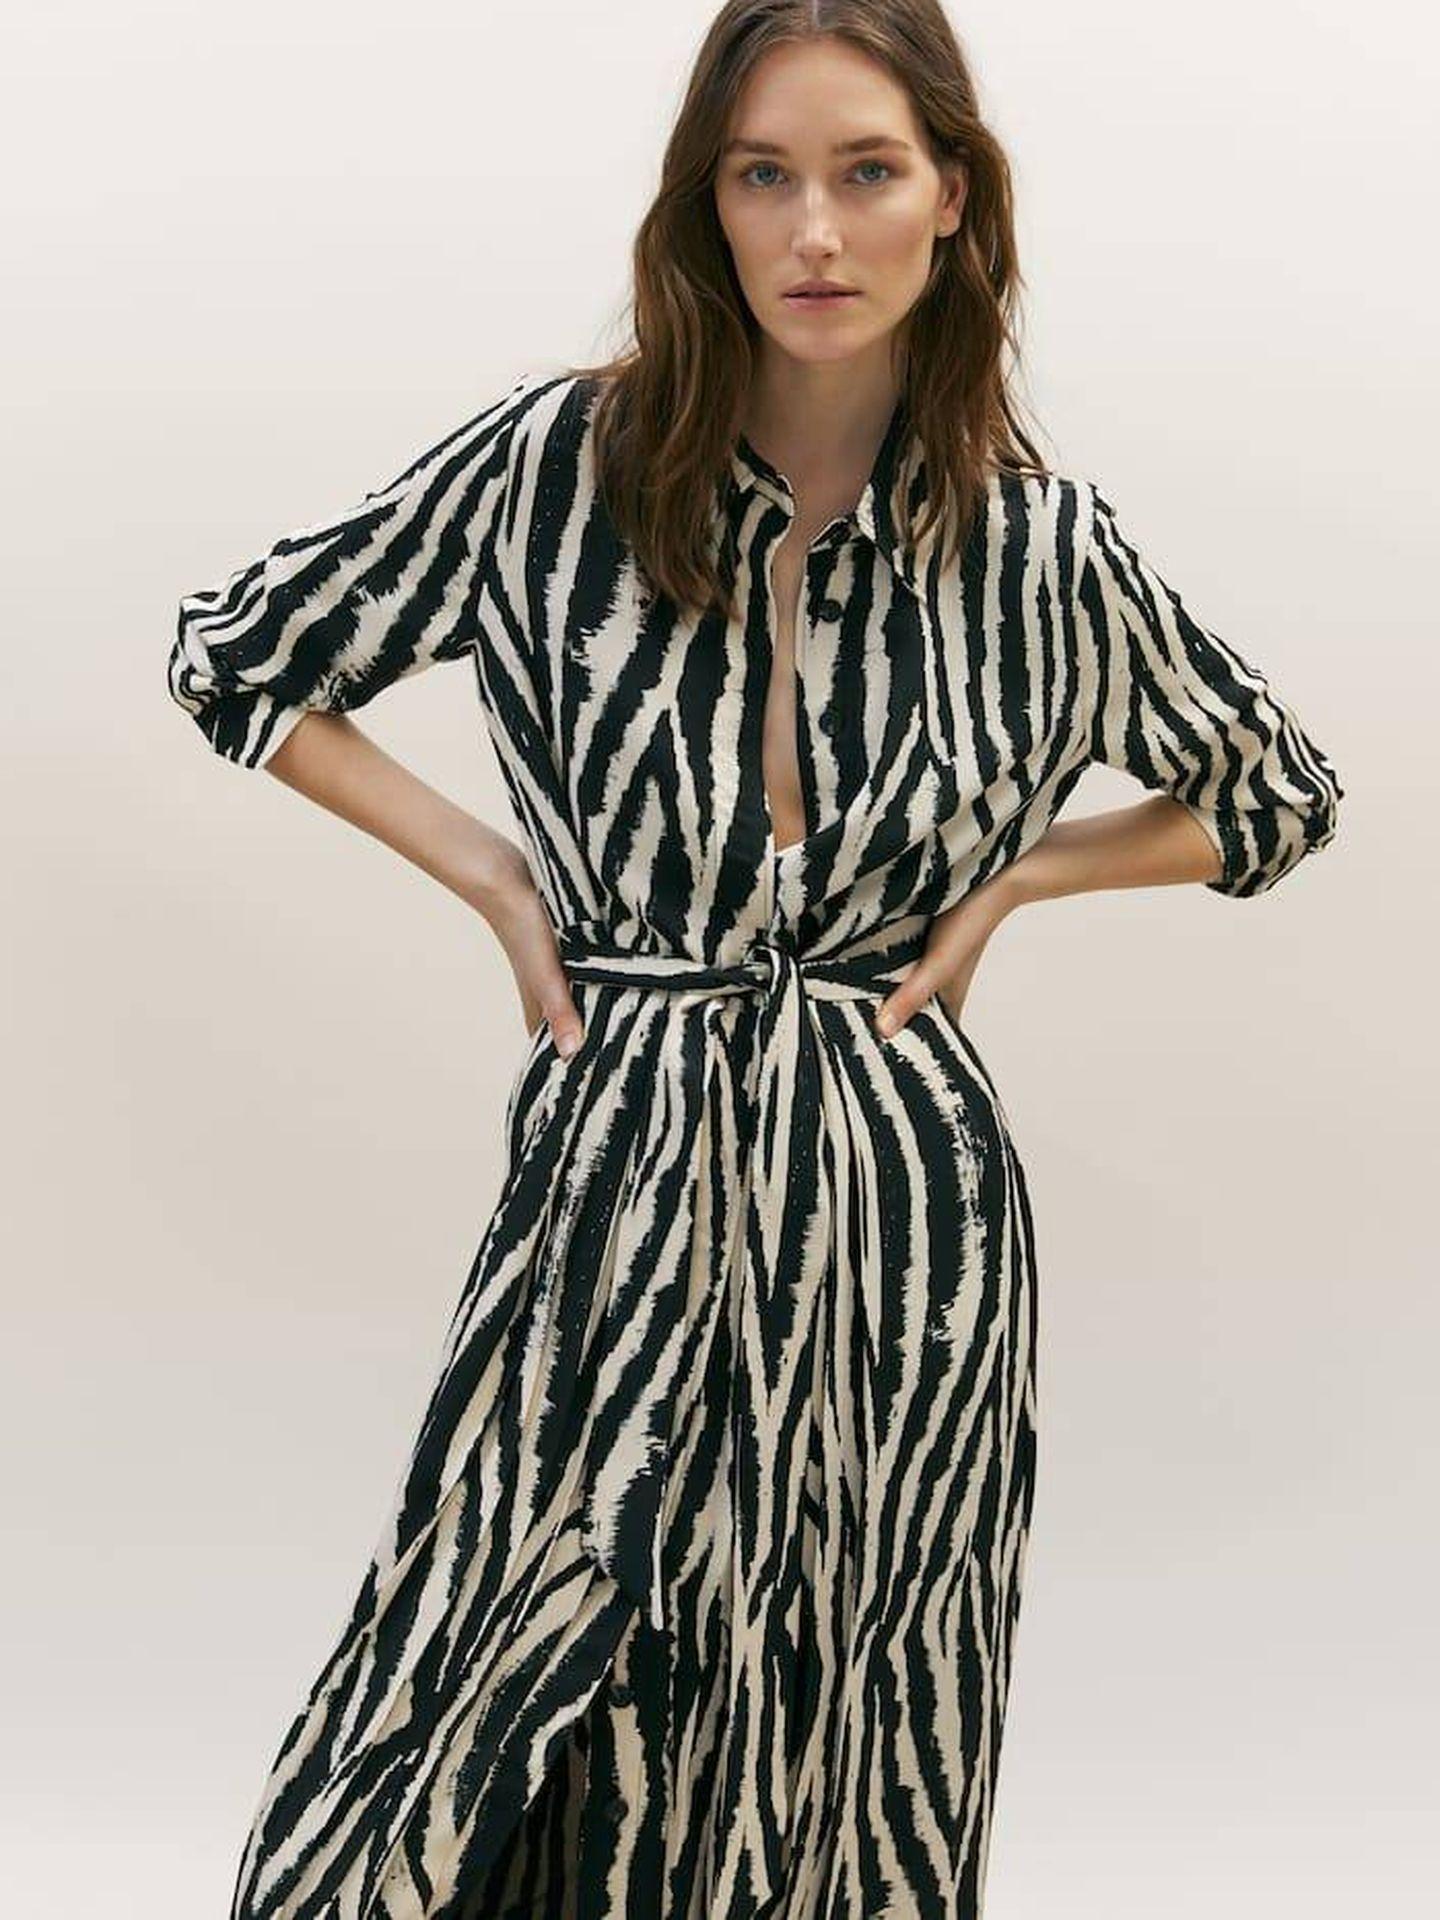 Vestido de animal print de Massimo Dutti. (Cortesía)